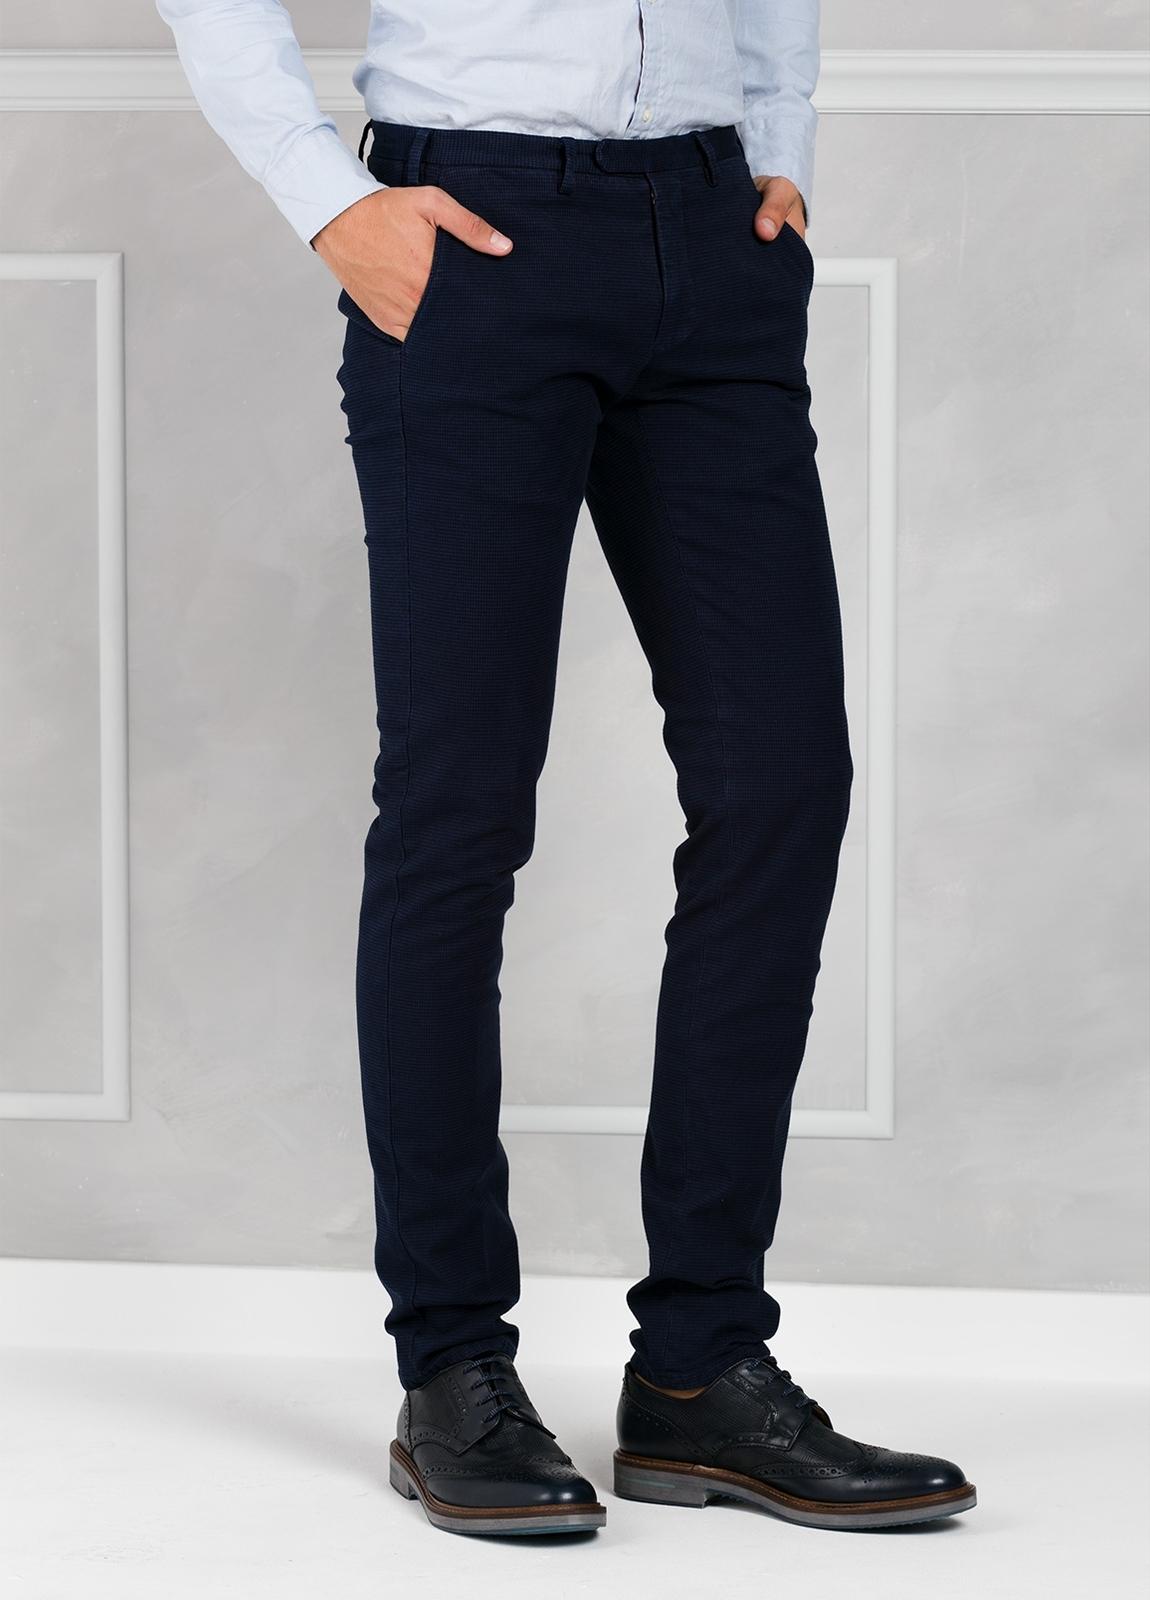 Pantalón sport pata de gallo slim fit color azul marino. 98% Algodón 2% Elastano. - Ítem1